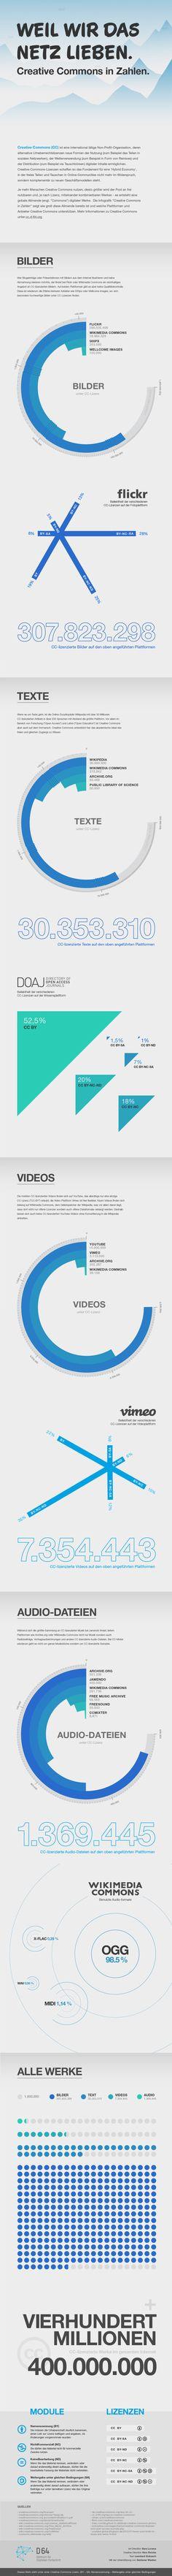 CC_in_zahlen_infografik